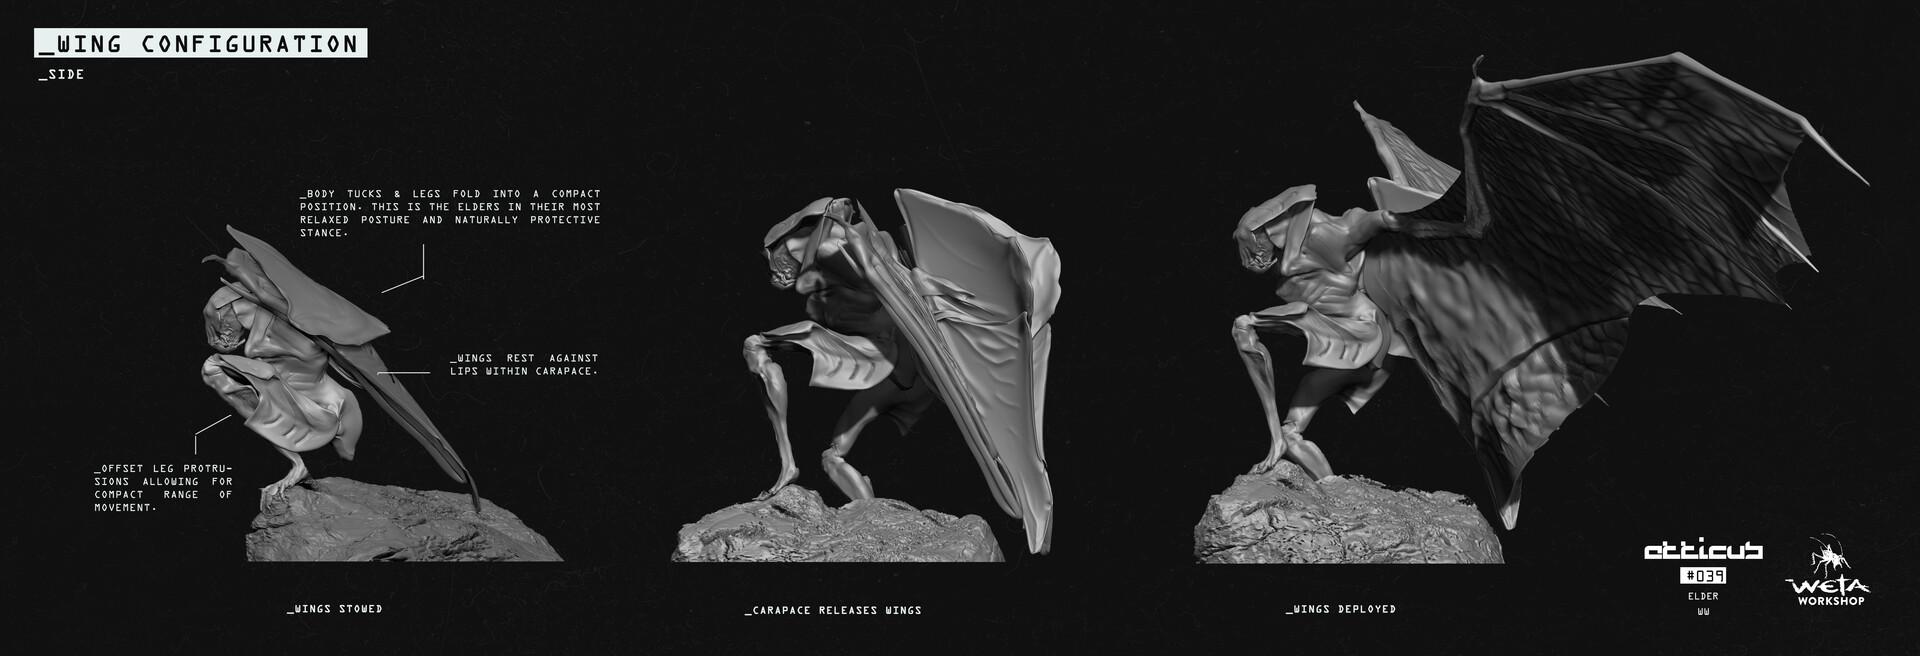 Elder Wing Configuration - Artists: Dane Madgwick + Russel Dongjun Lu + Greg Tozer